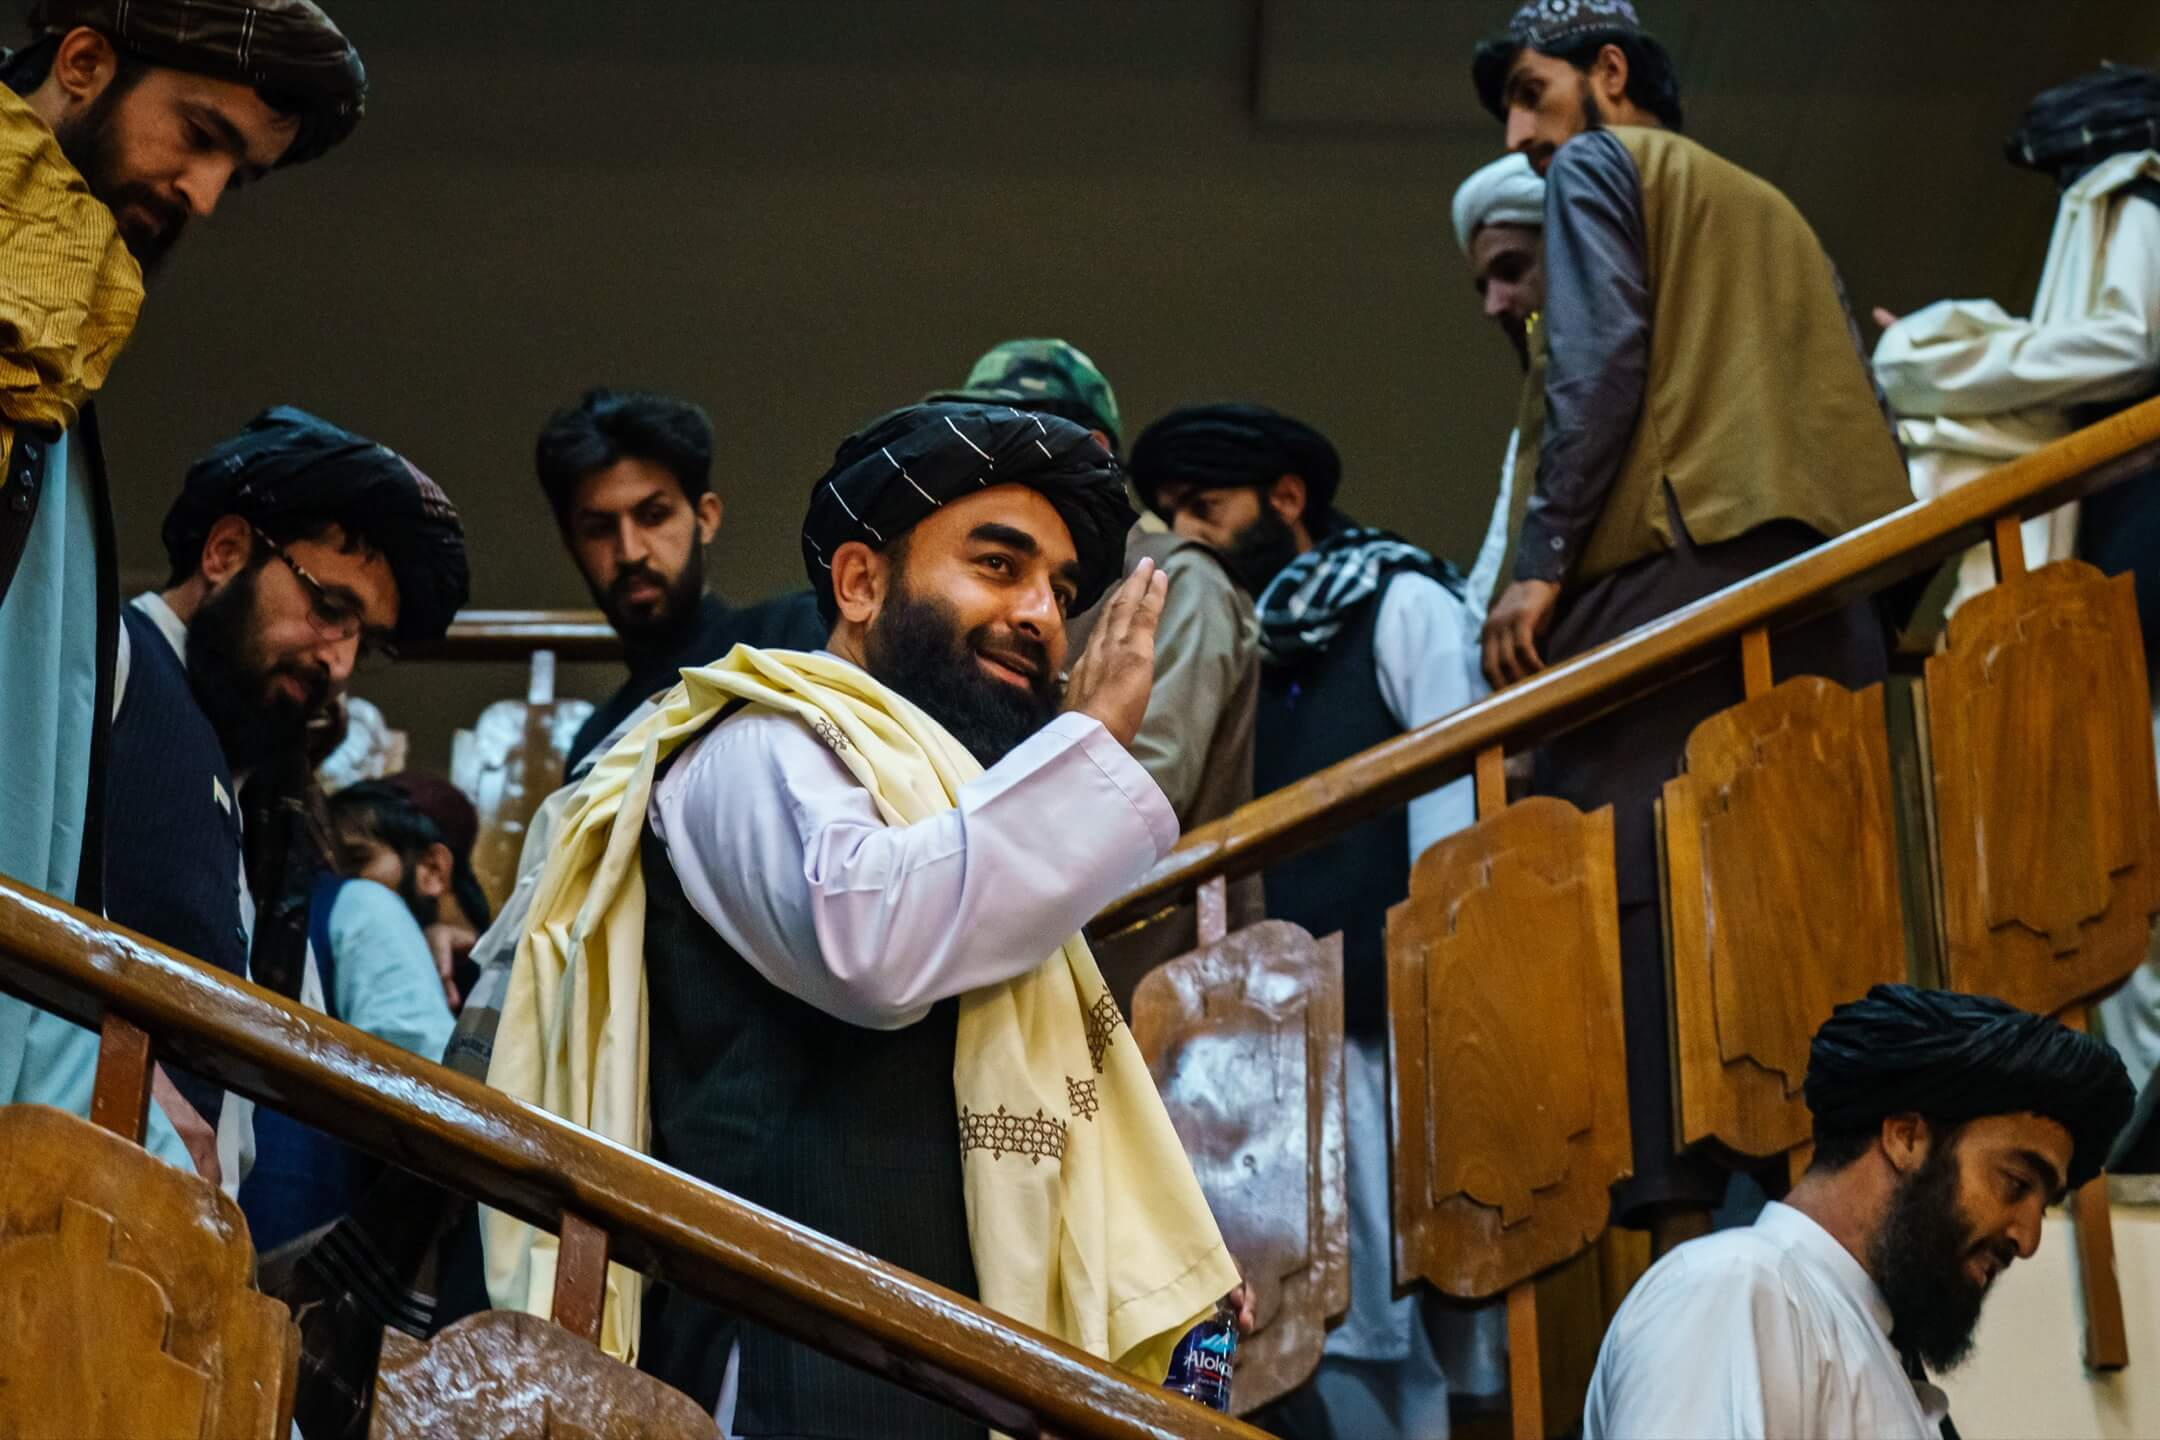 2021年8月17日,阿富汗喀布爾,塔利班發言人穆賈希德(Zabihullah Mujahid)首次記者會。 攝:Marcus Yam/Los Angeles Times/Getty Images